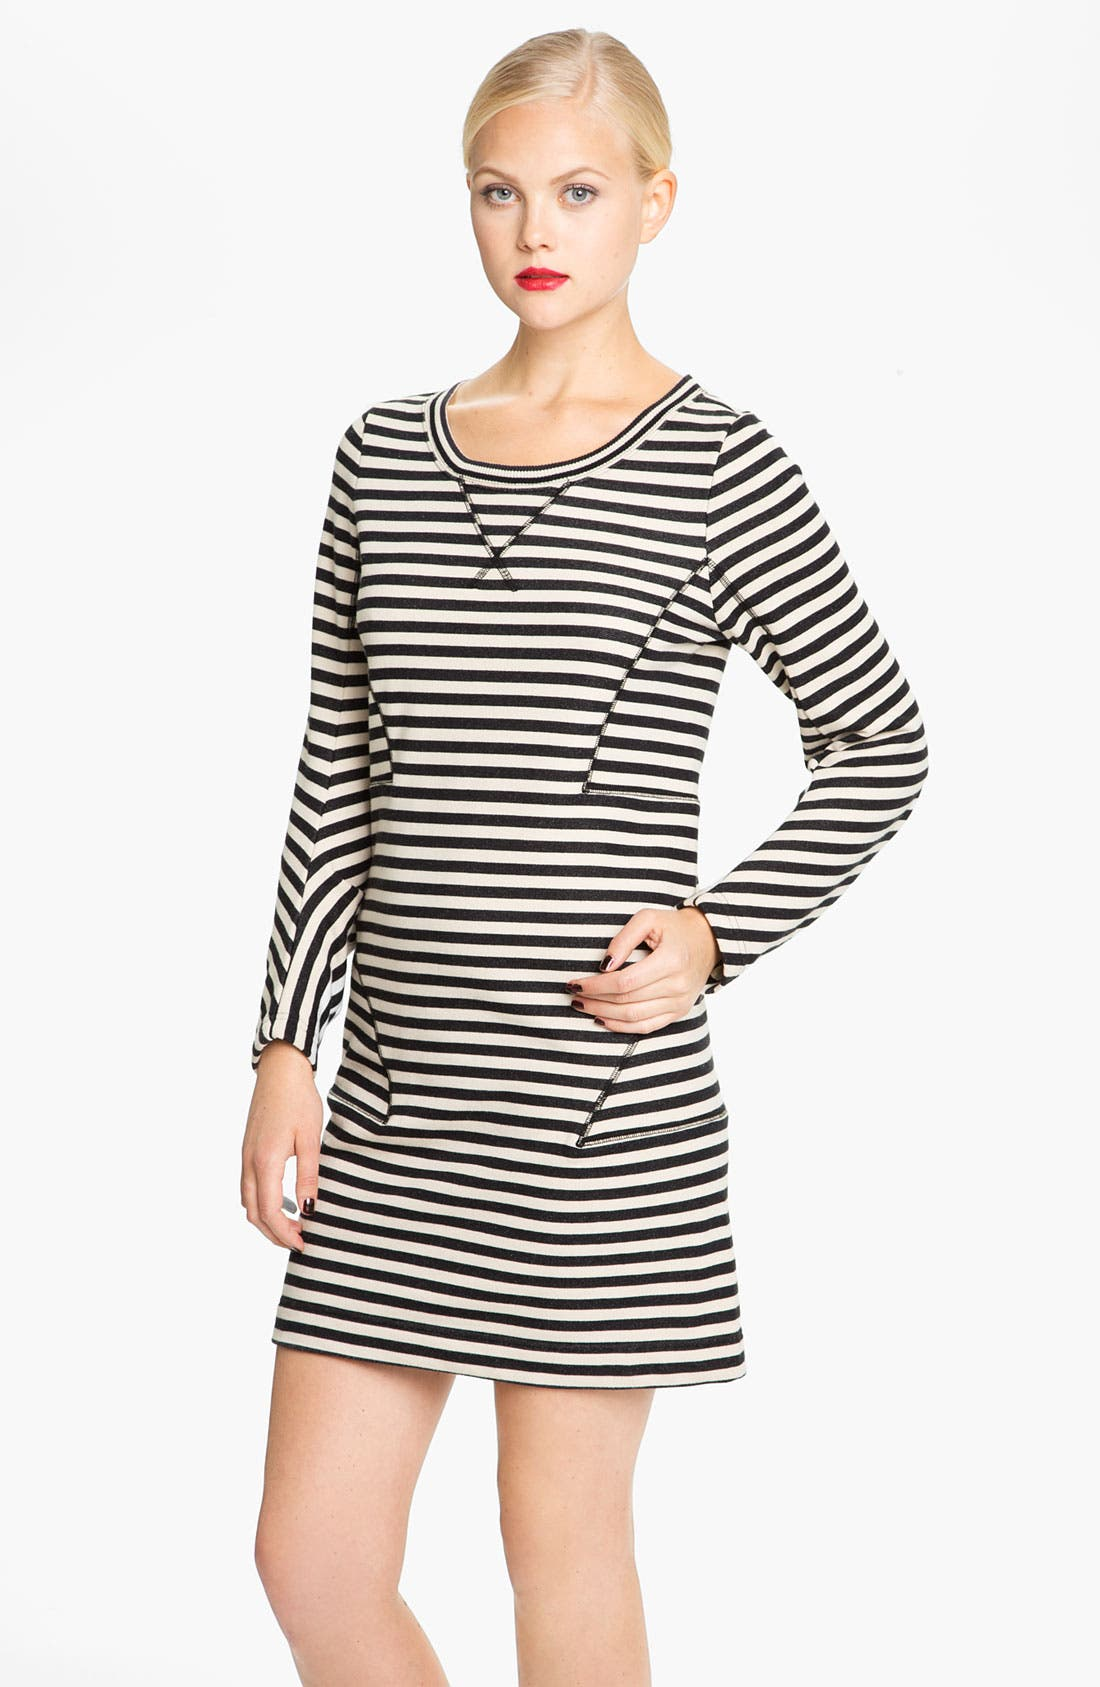 Main Image - MARC BY MARC JACOBS 'Ben' Stripe Sweatshirt Dress